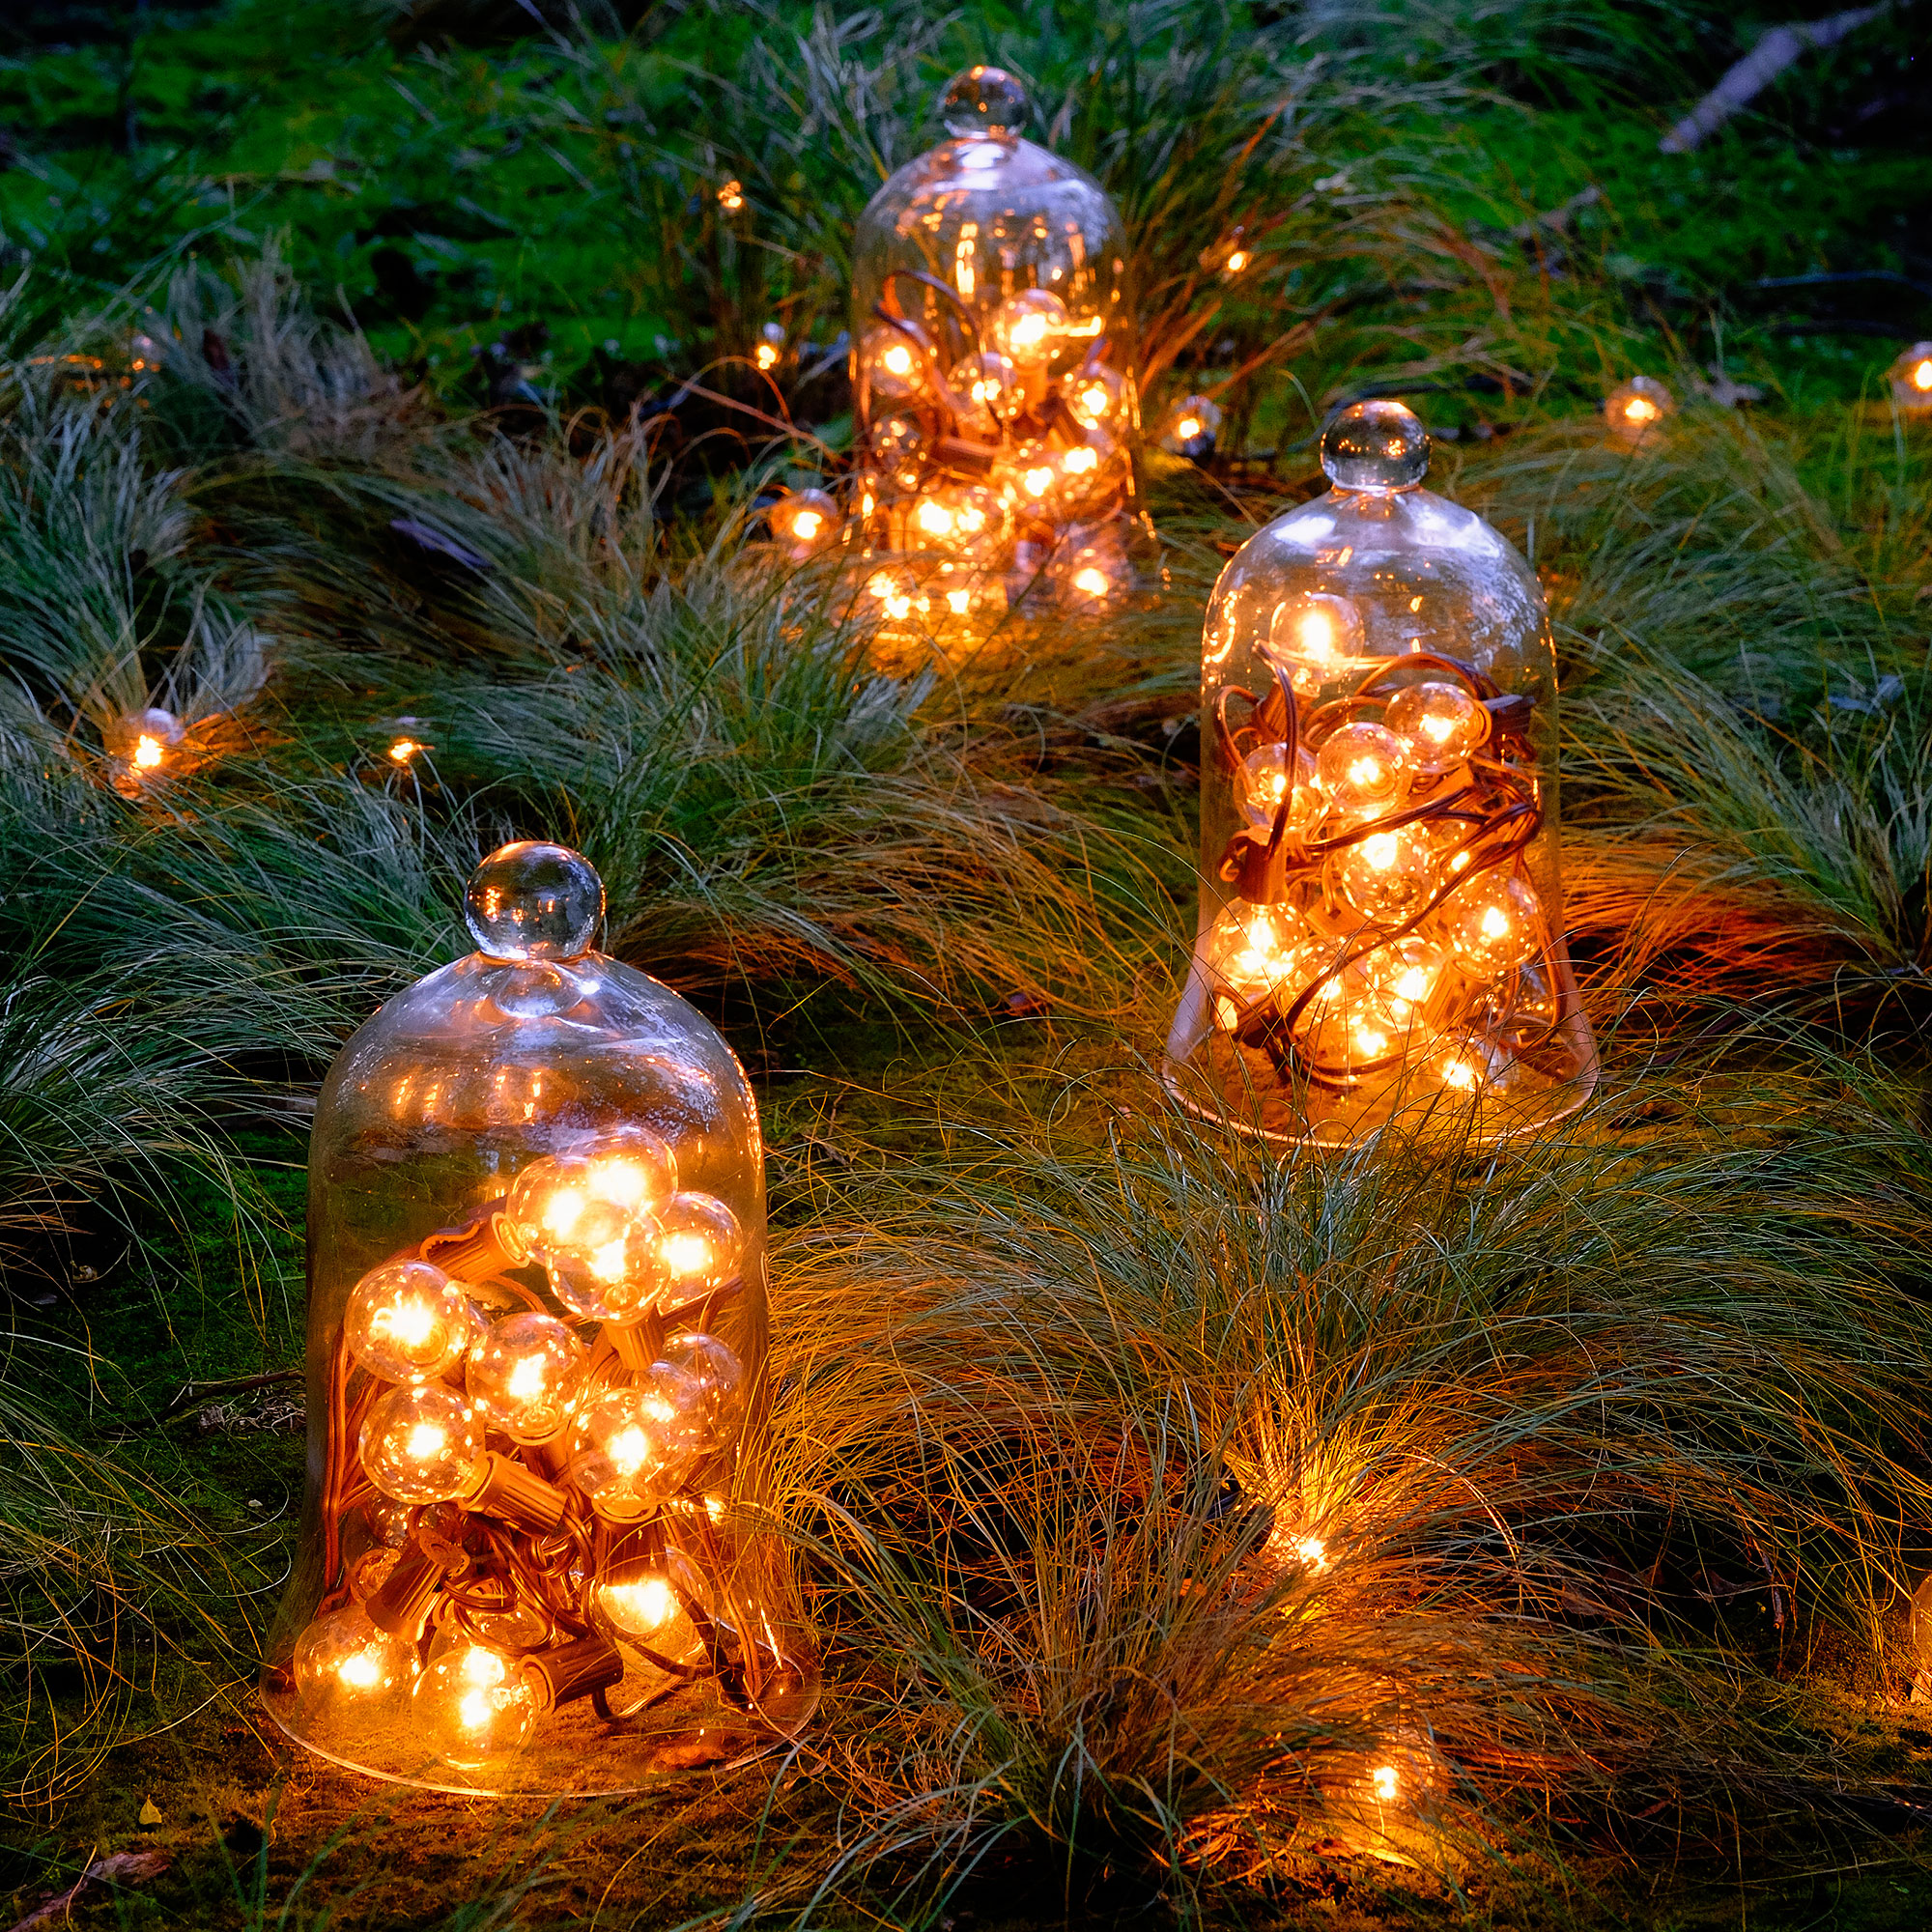 Outdoor Christmas Decorations Sunset Sunset Magazine